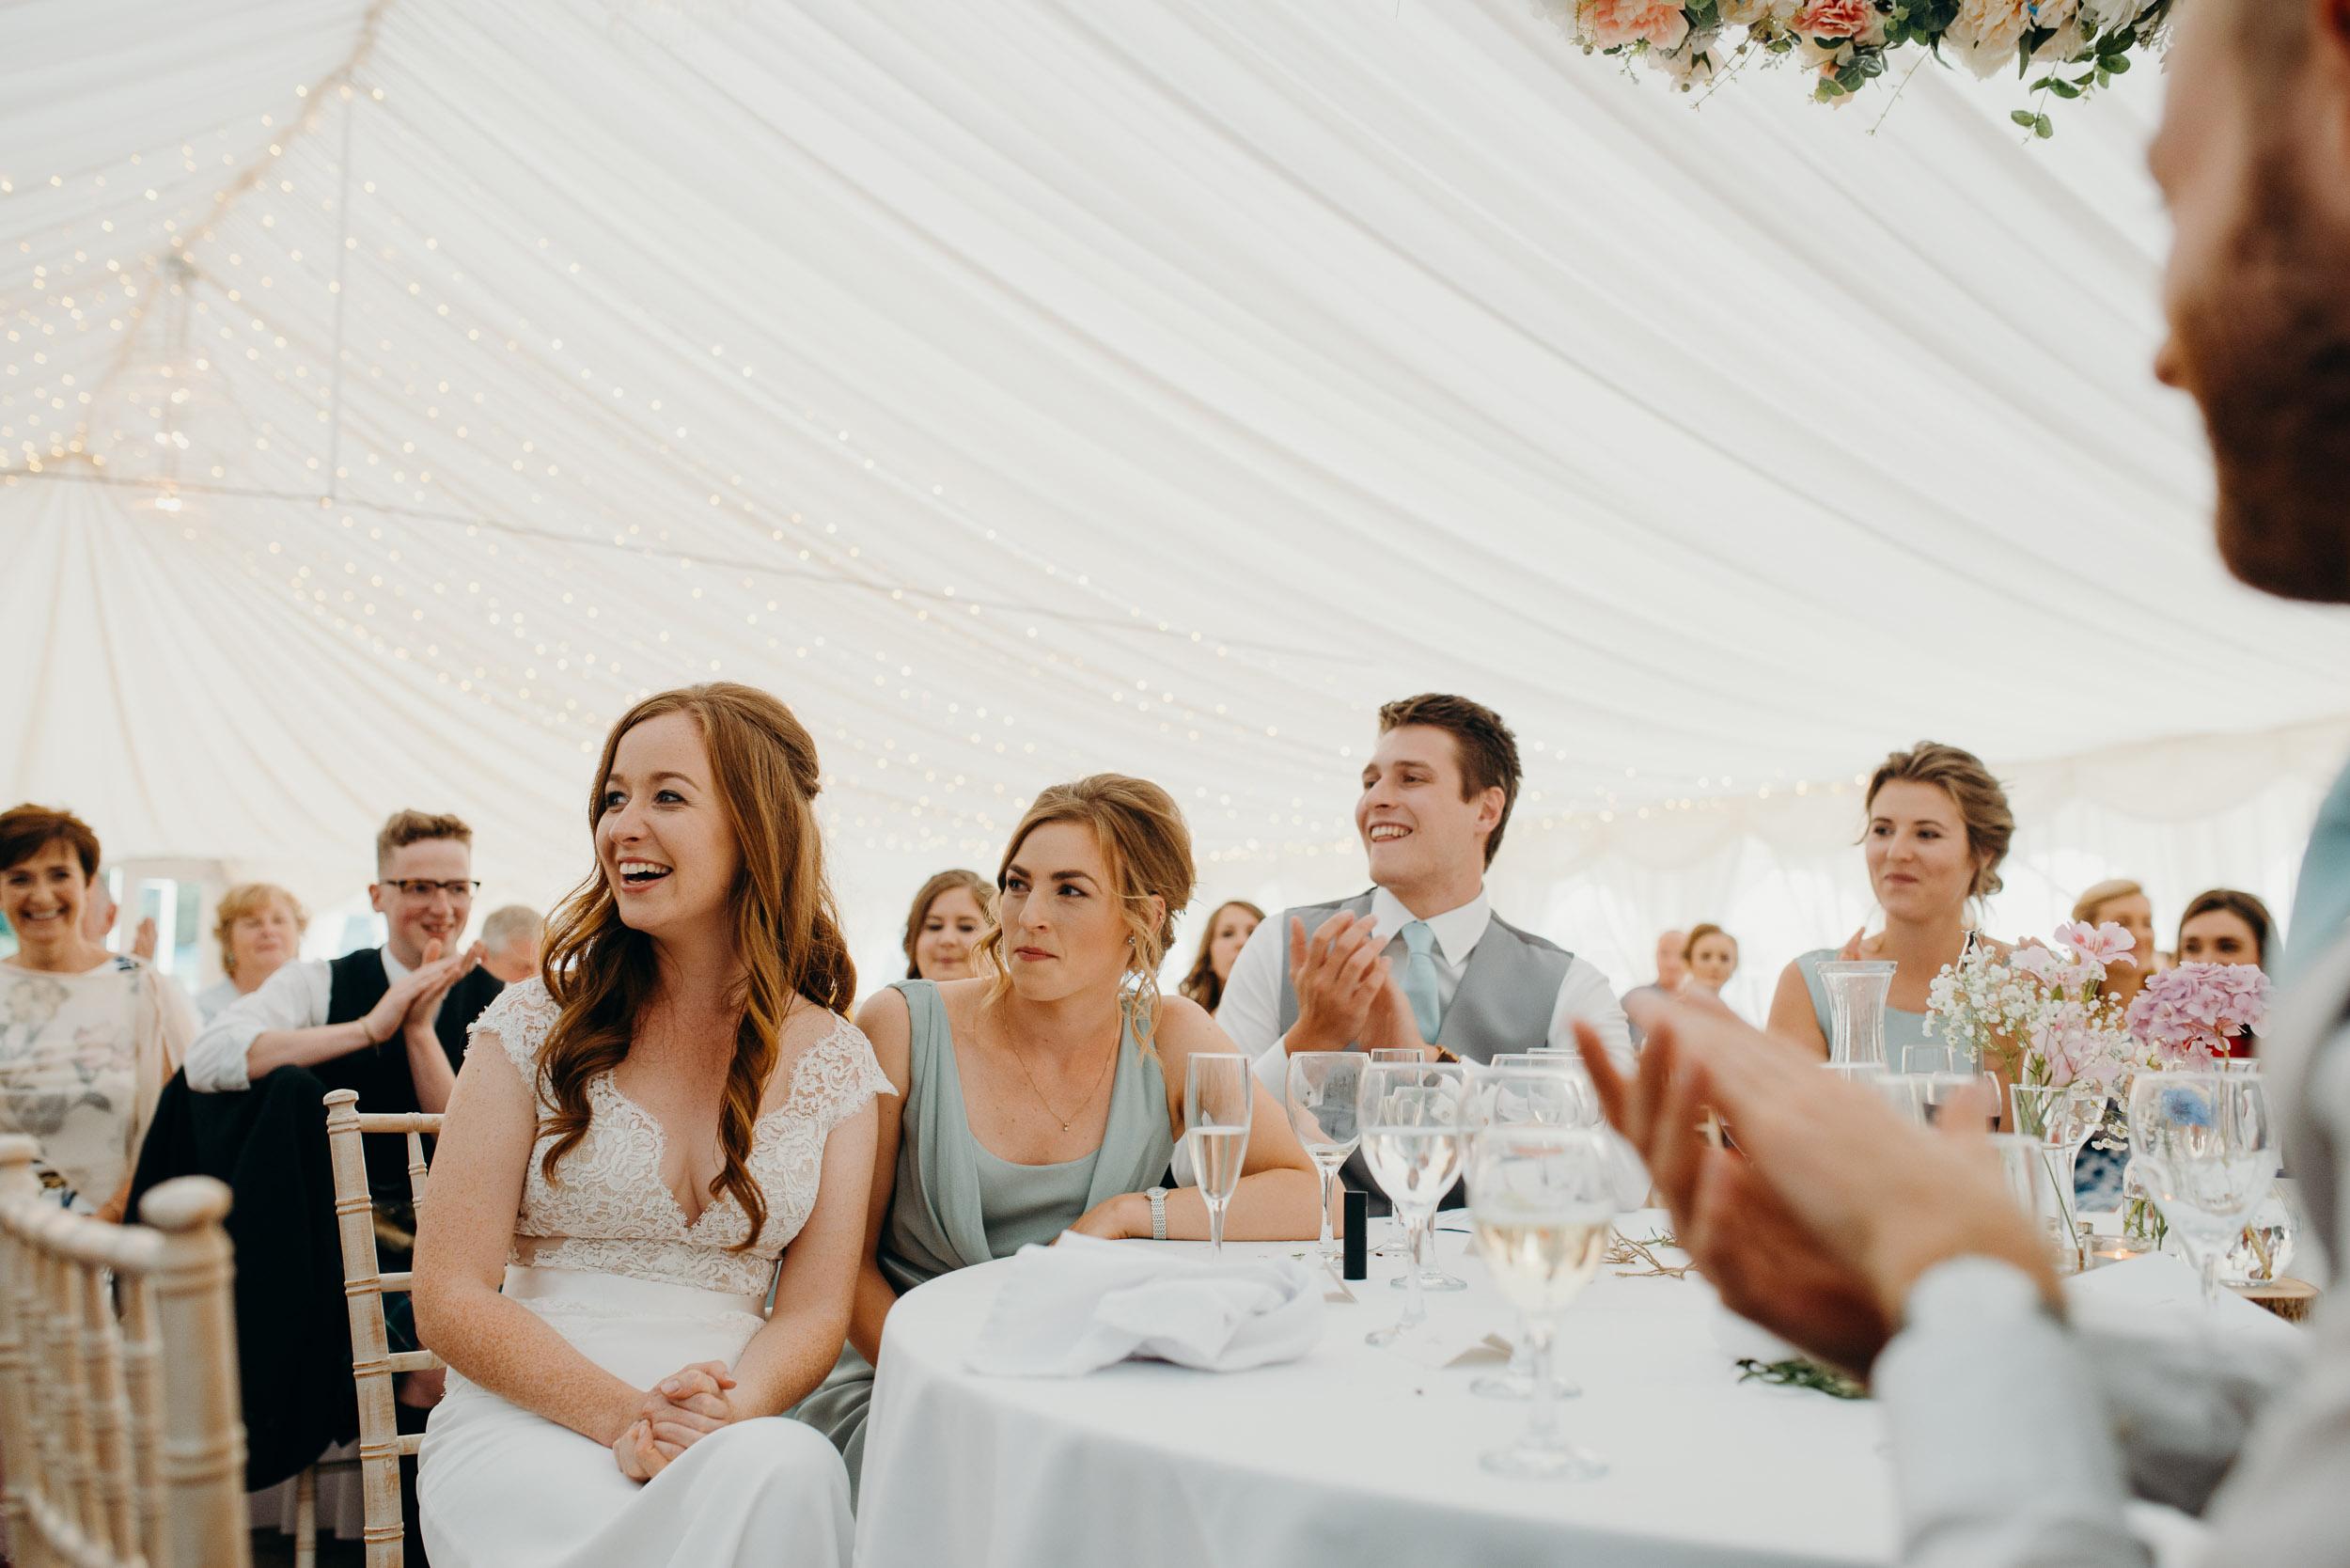 drenagh estate wedding photography-113.jpg